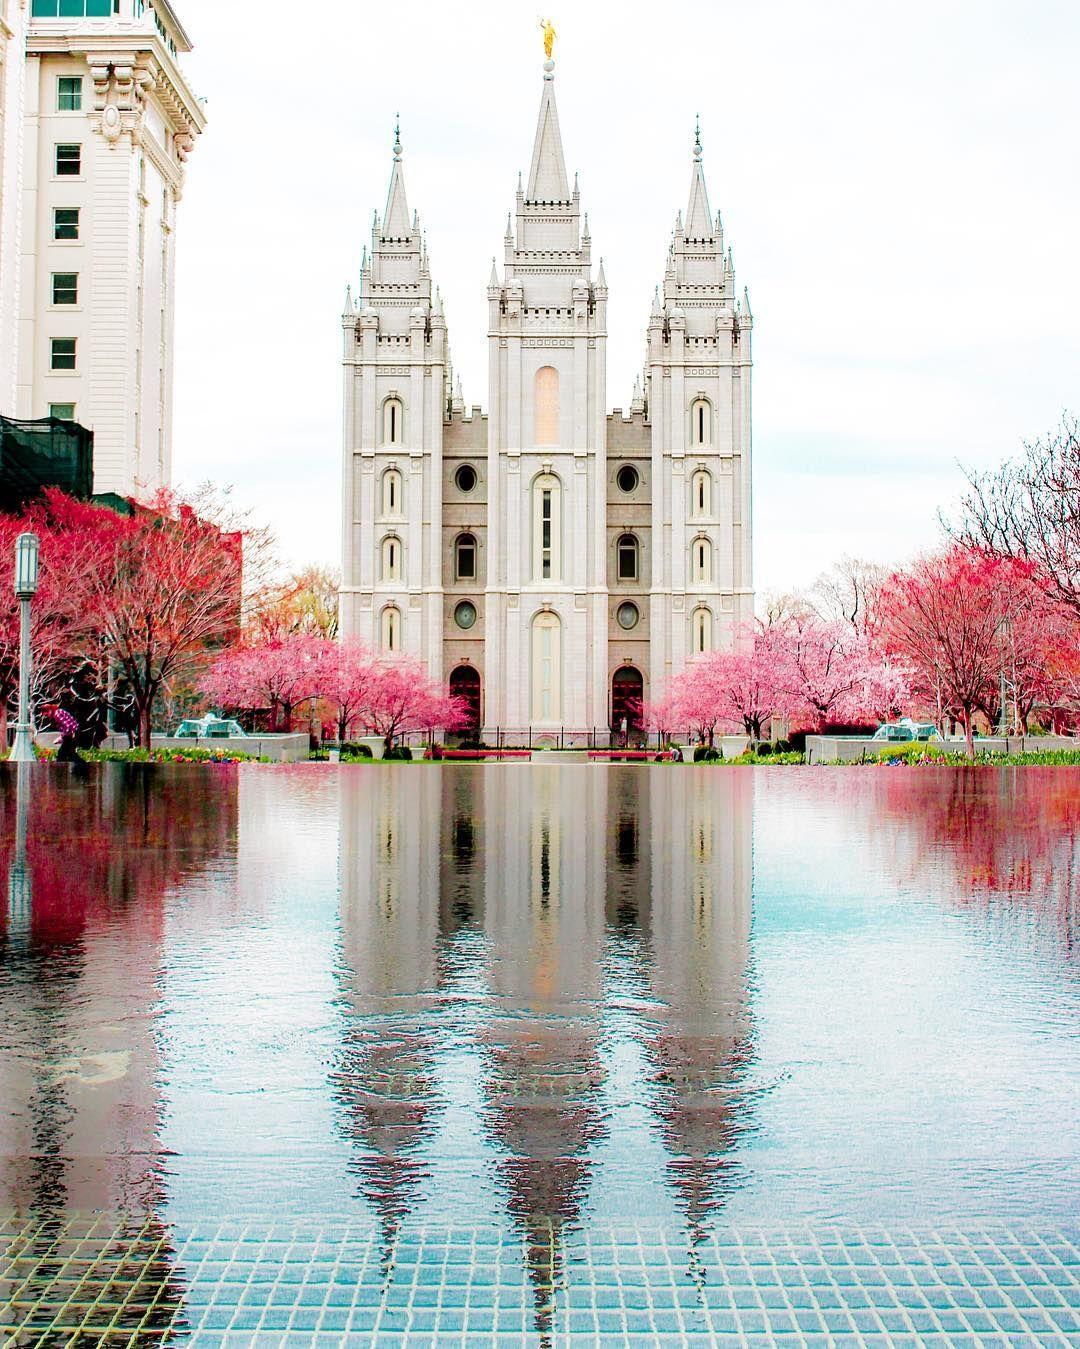 Salt Lake City, Utah Arrest Warrant Attorney: Overson Law Firm